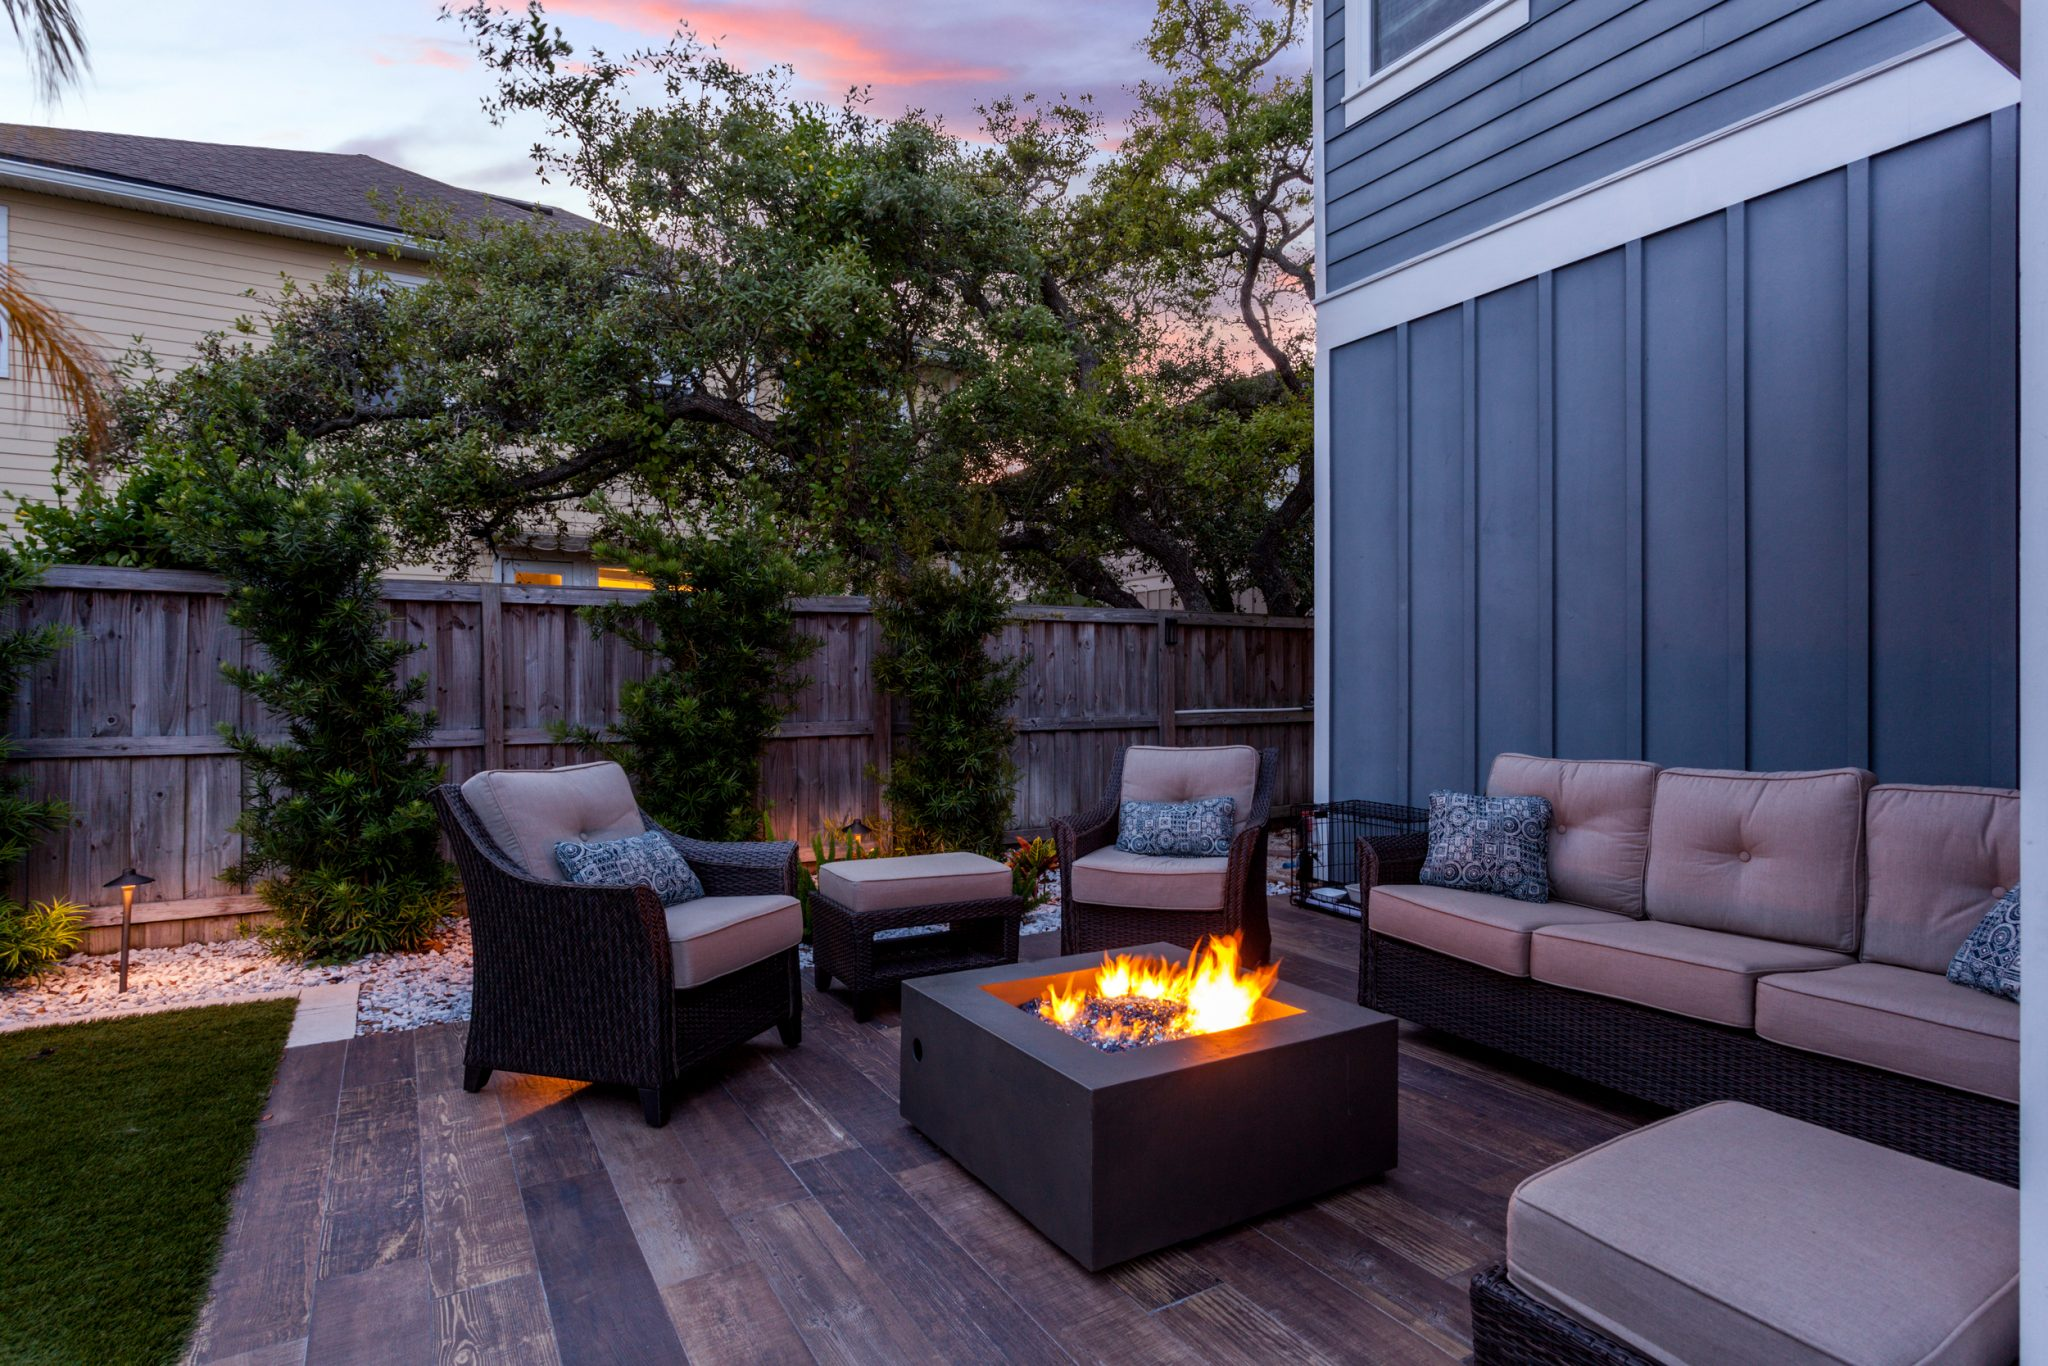 Quarantine DIY Home Improvement Projects Fire Pit